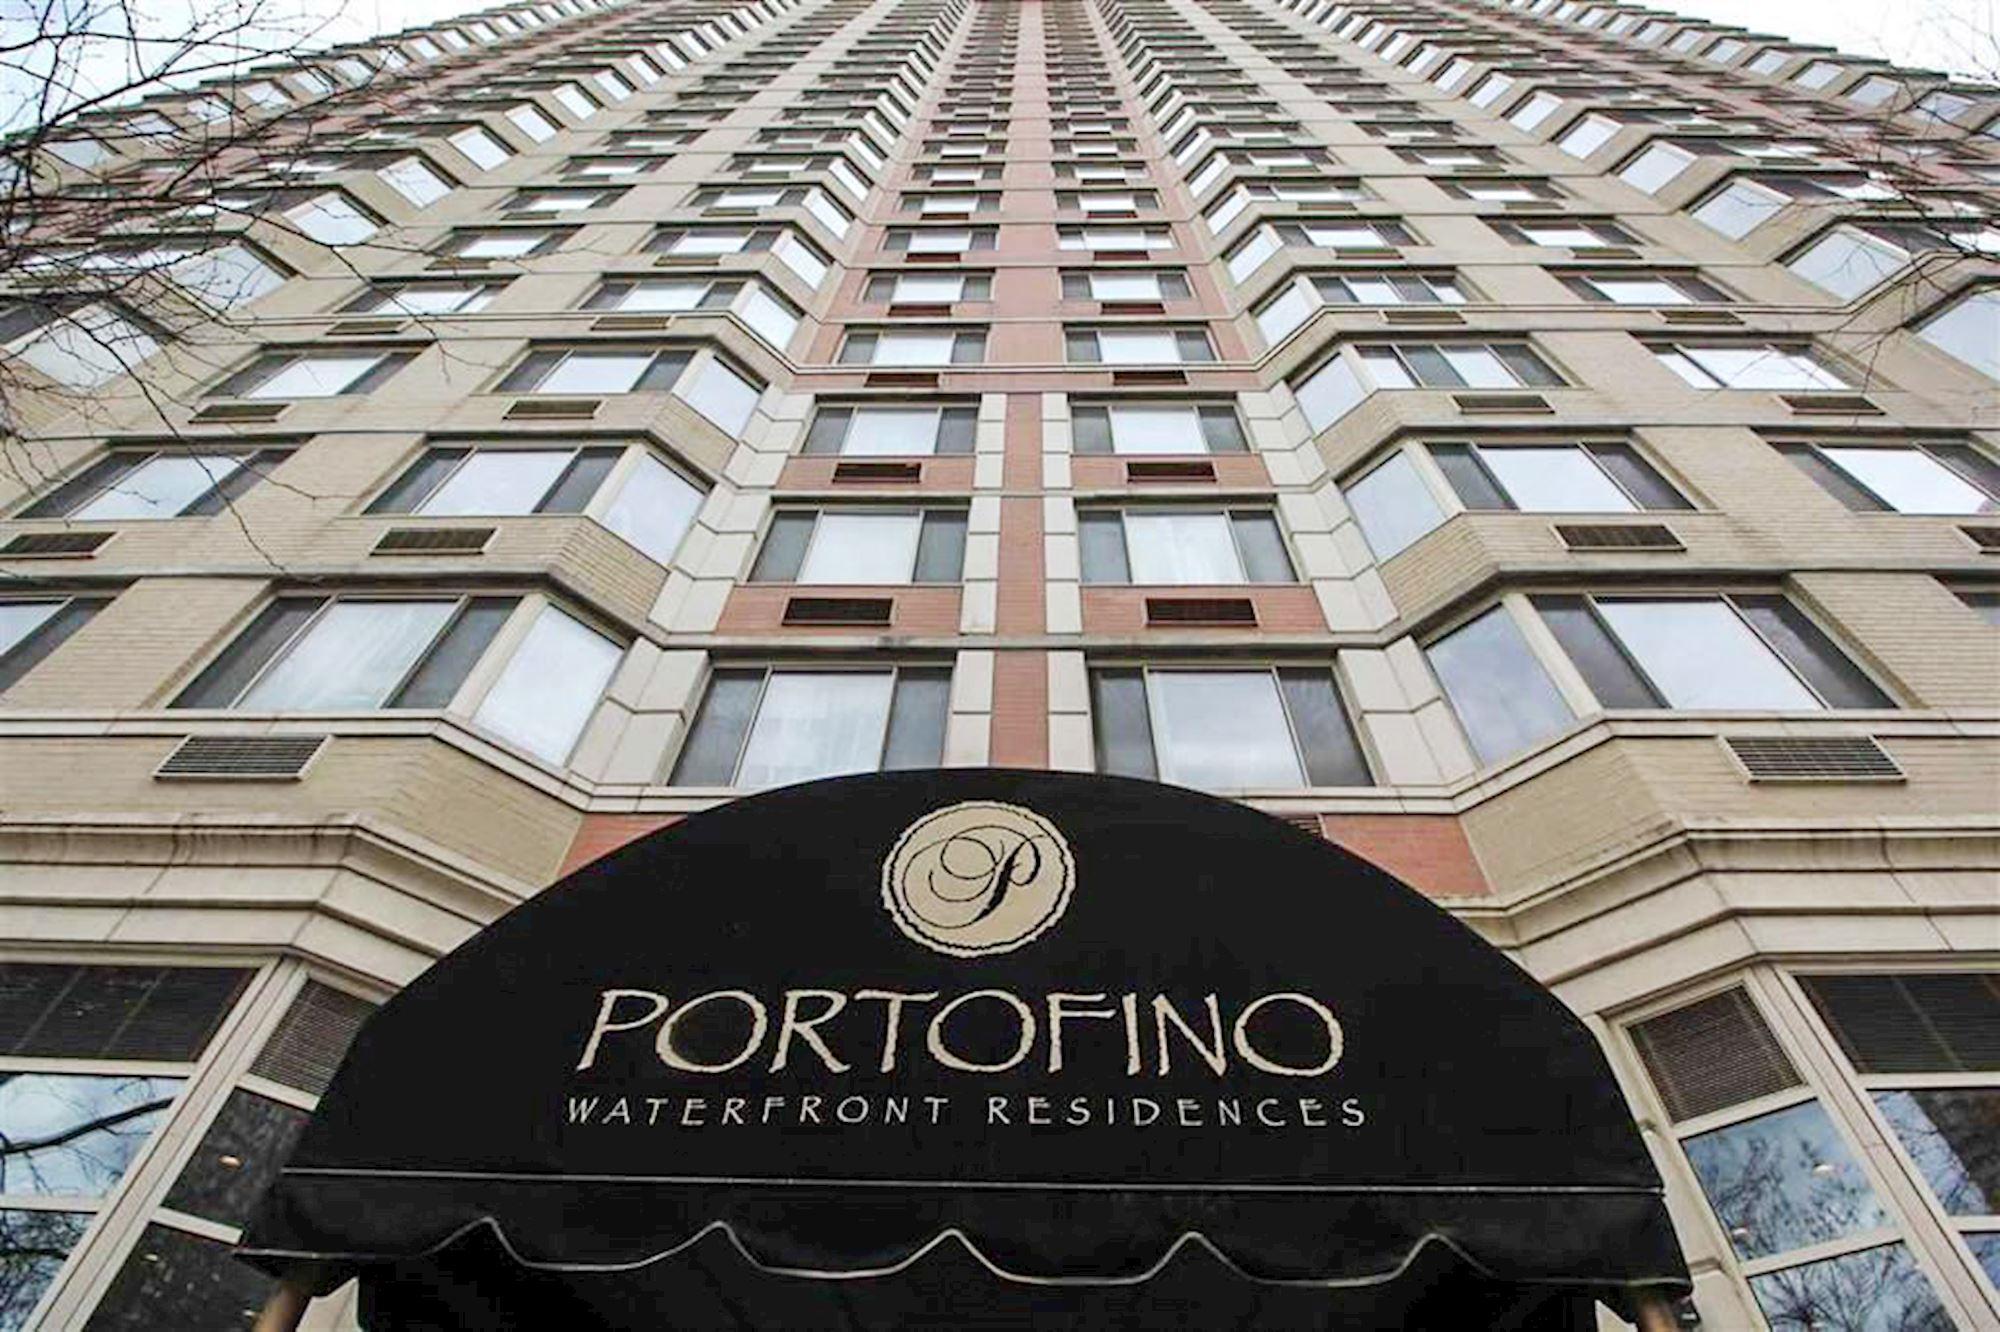 Portofino Waterfront Residences Jersey City